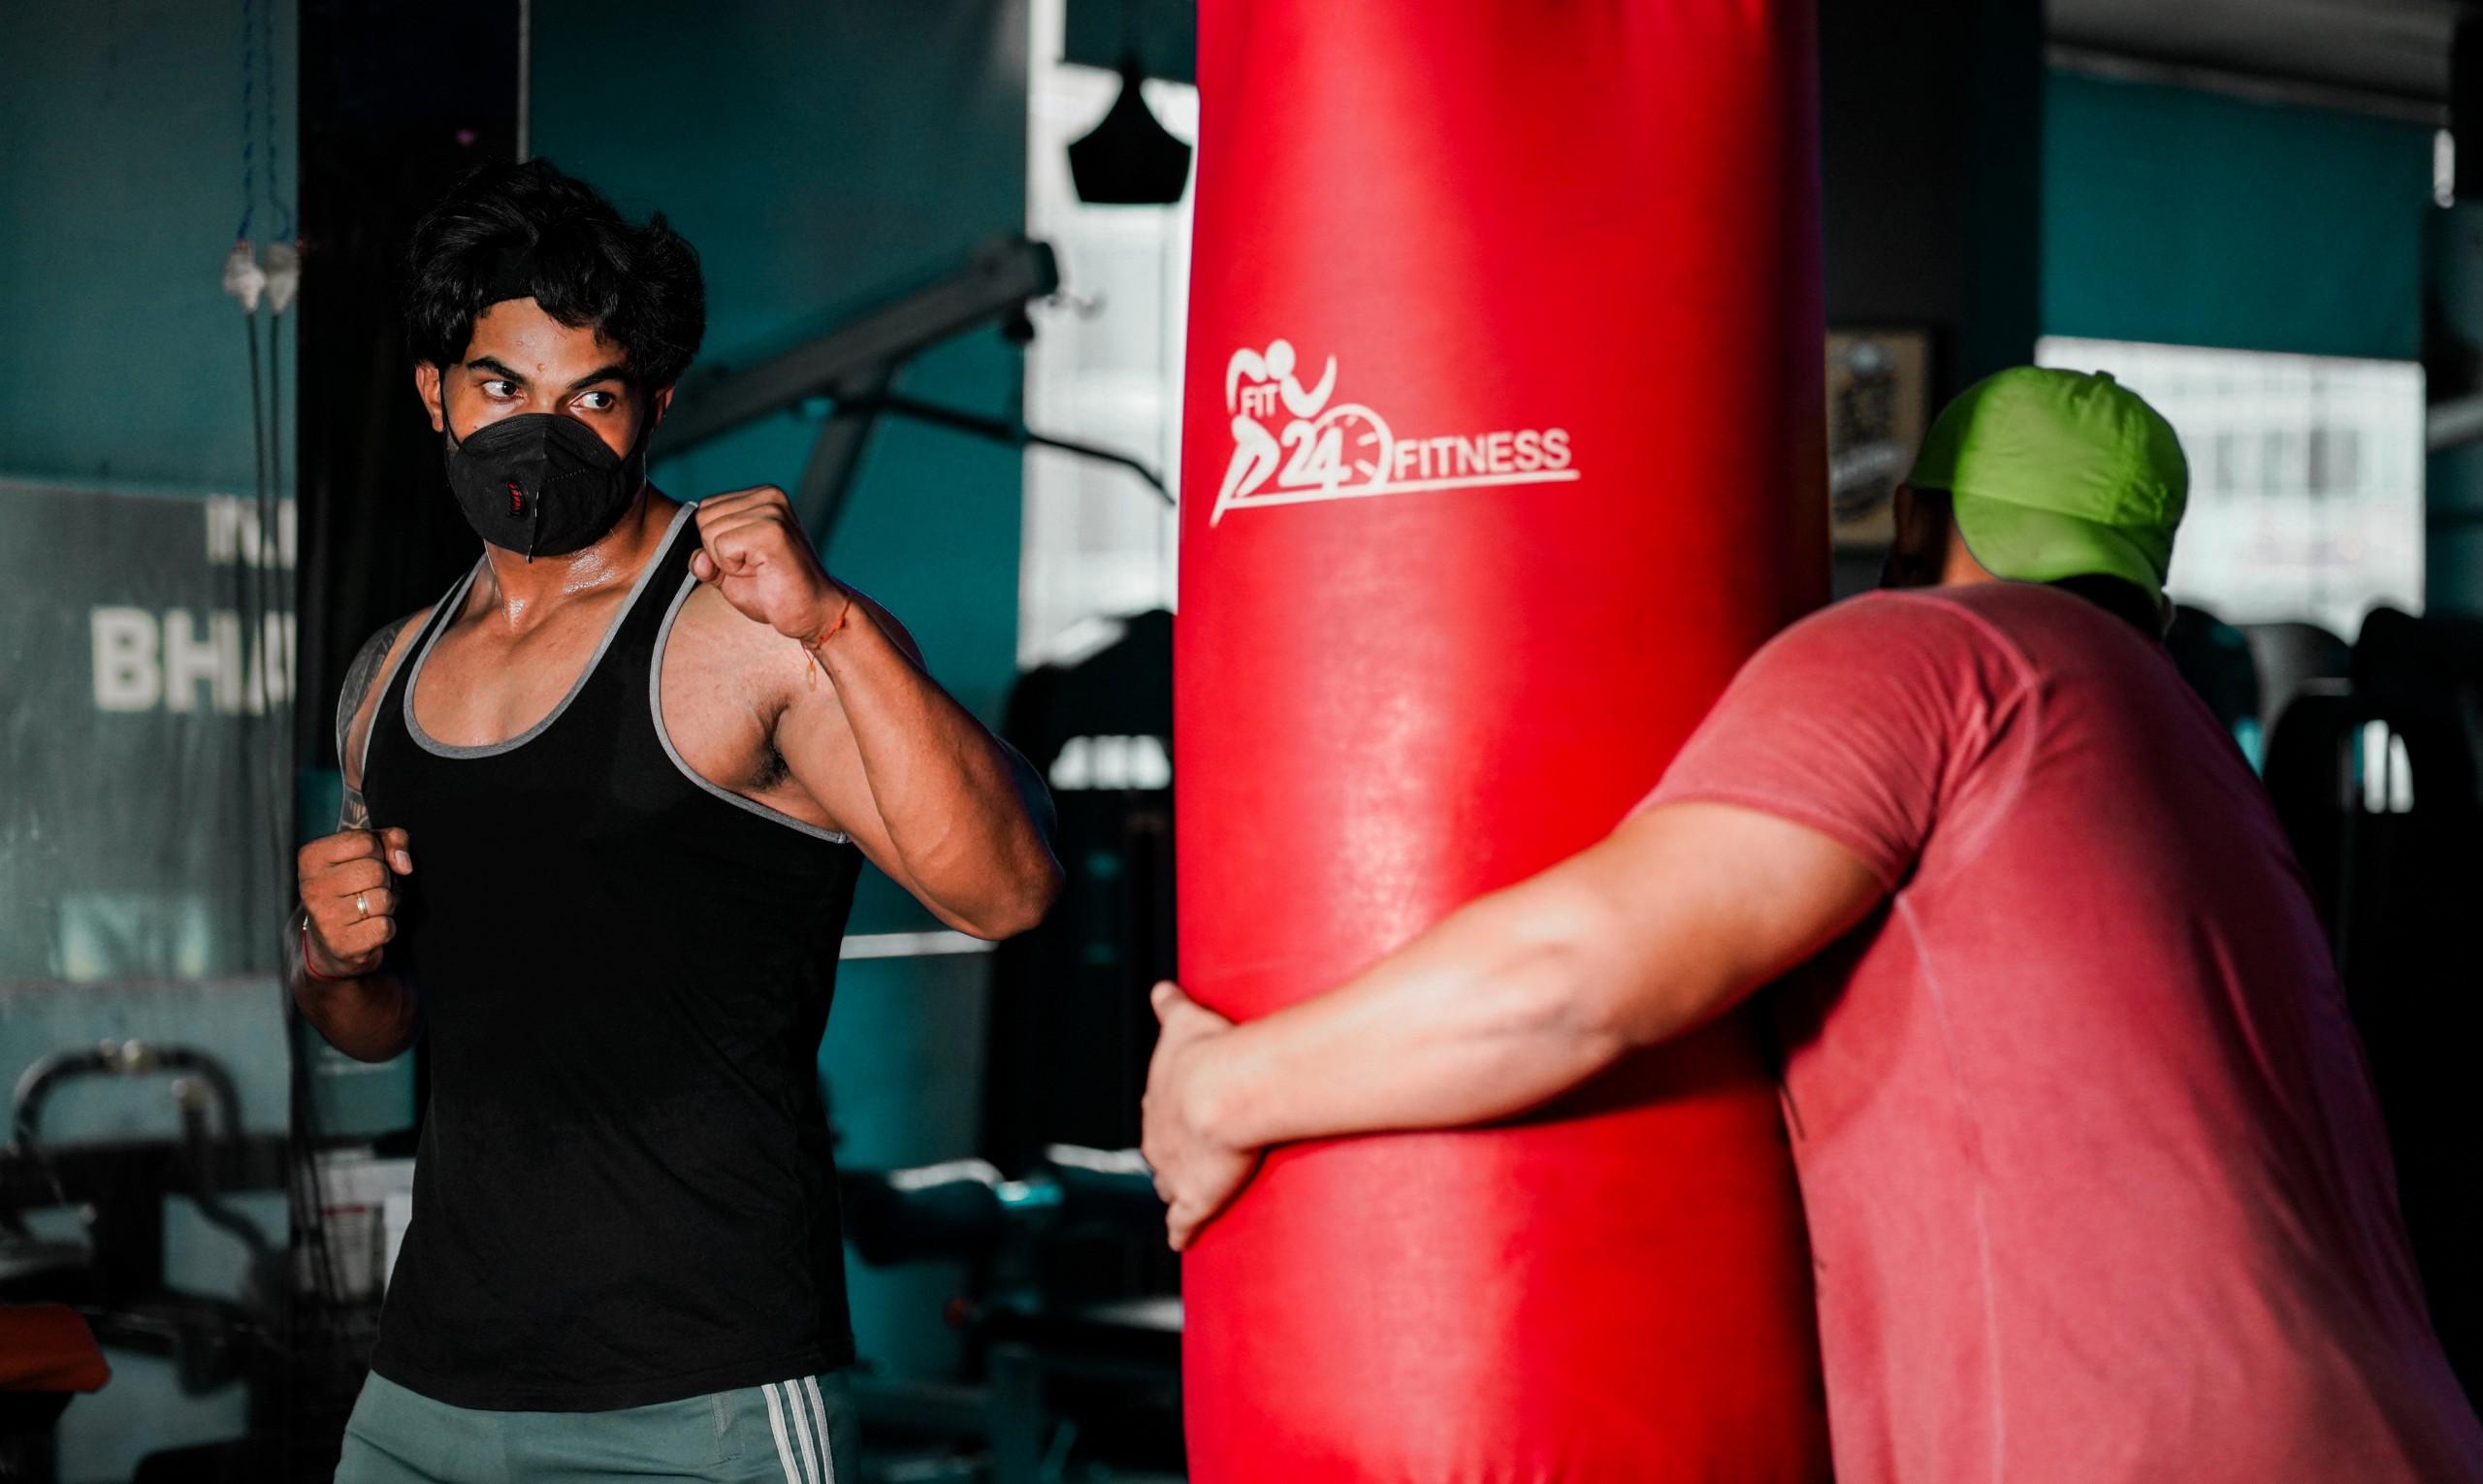 Punching Exercise at gym